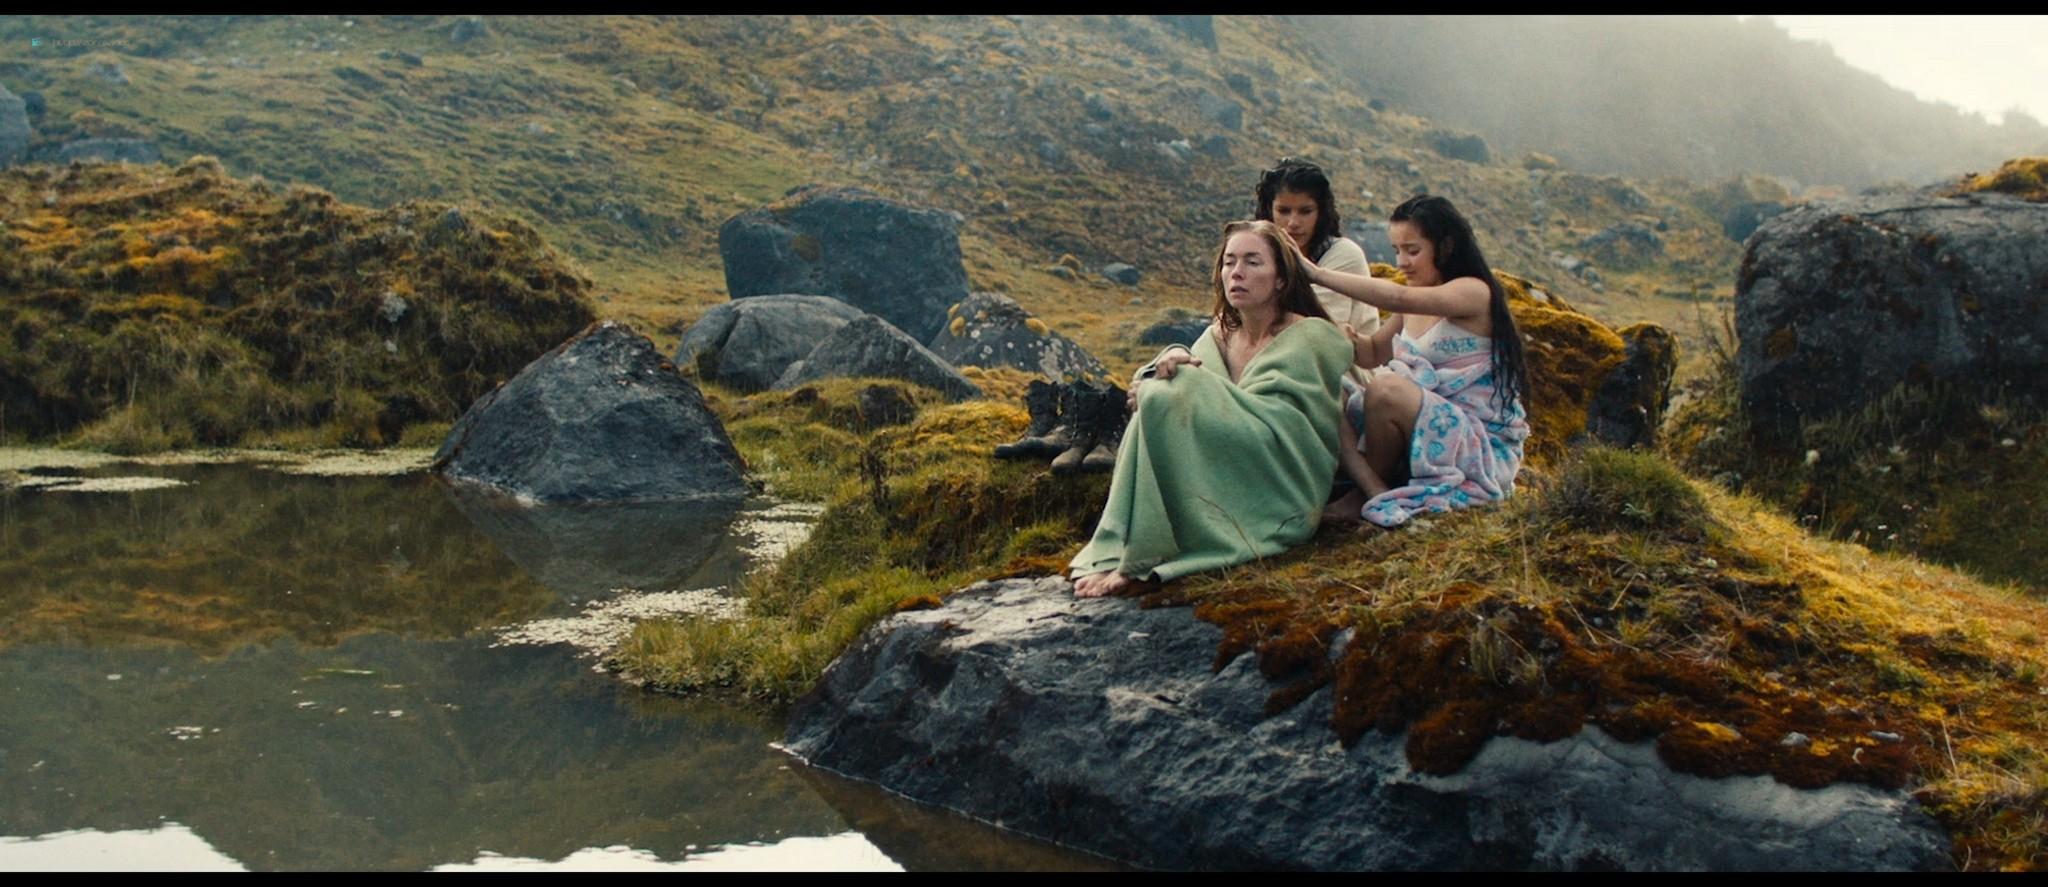 Julianne Nicholson pokies Karen Quintero, Laura Castrillón sexy - Monos (2019) HD 1080p BluRay (15)